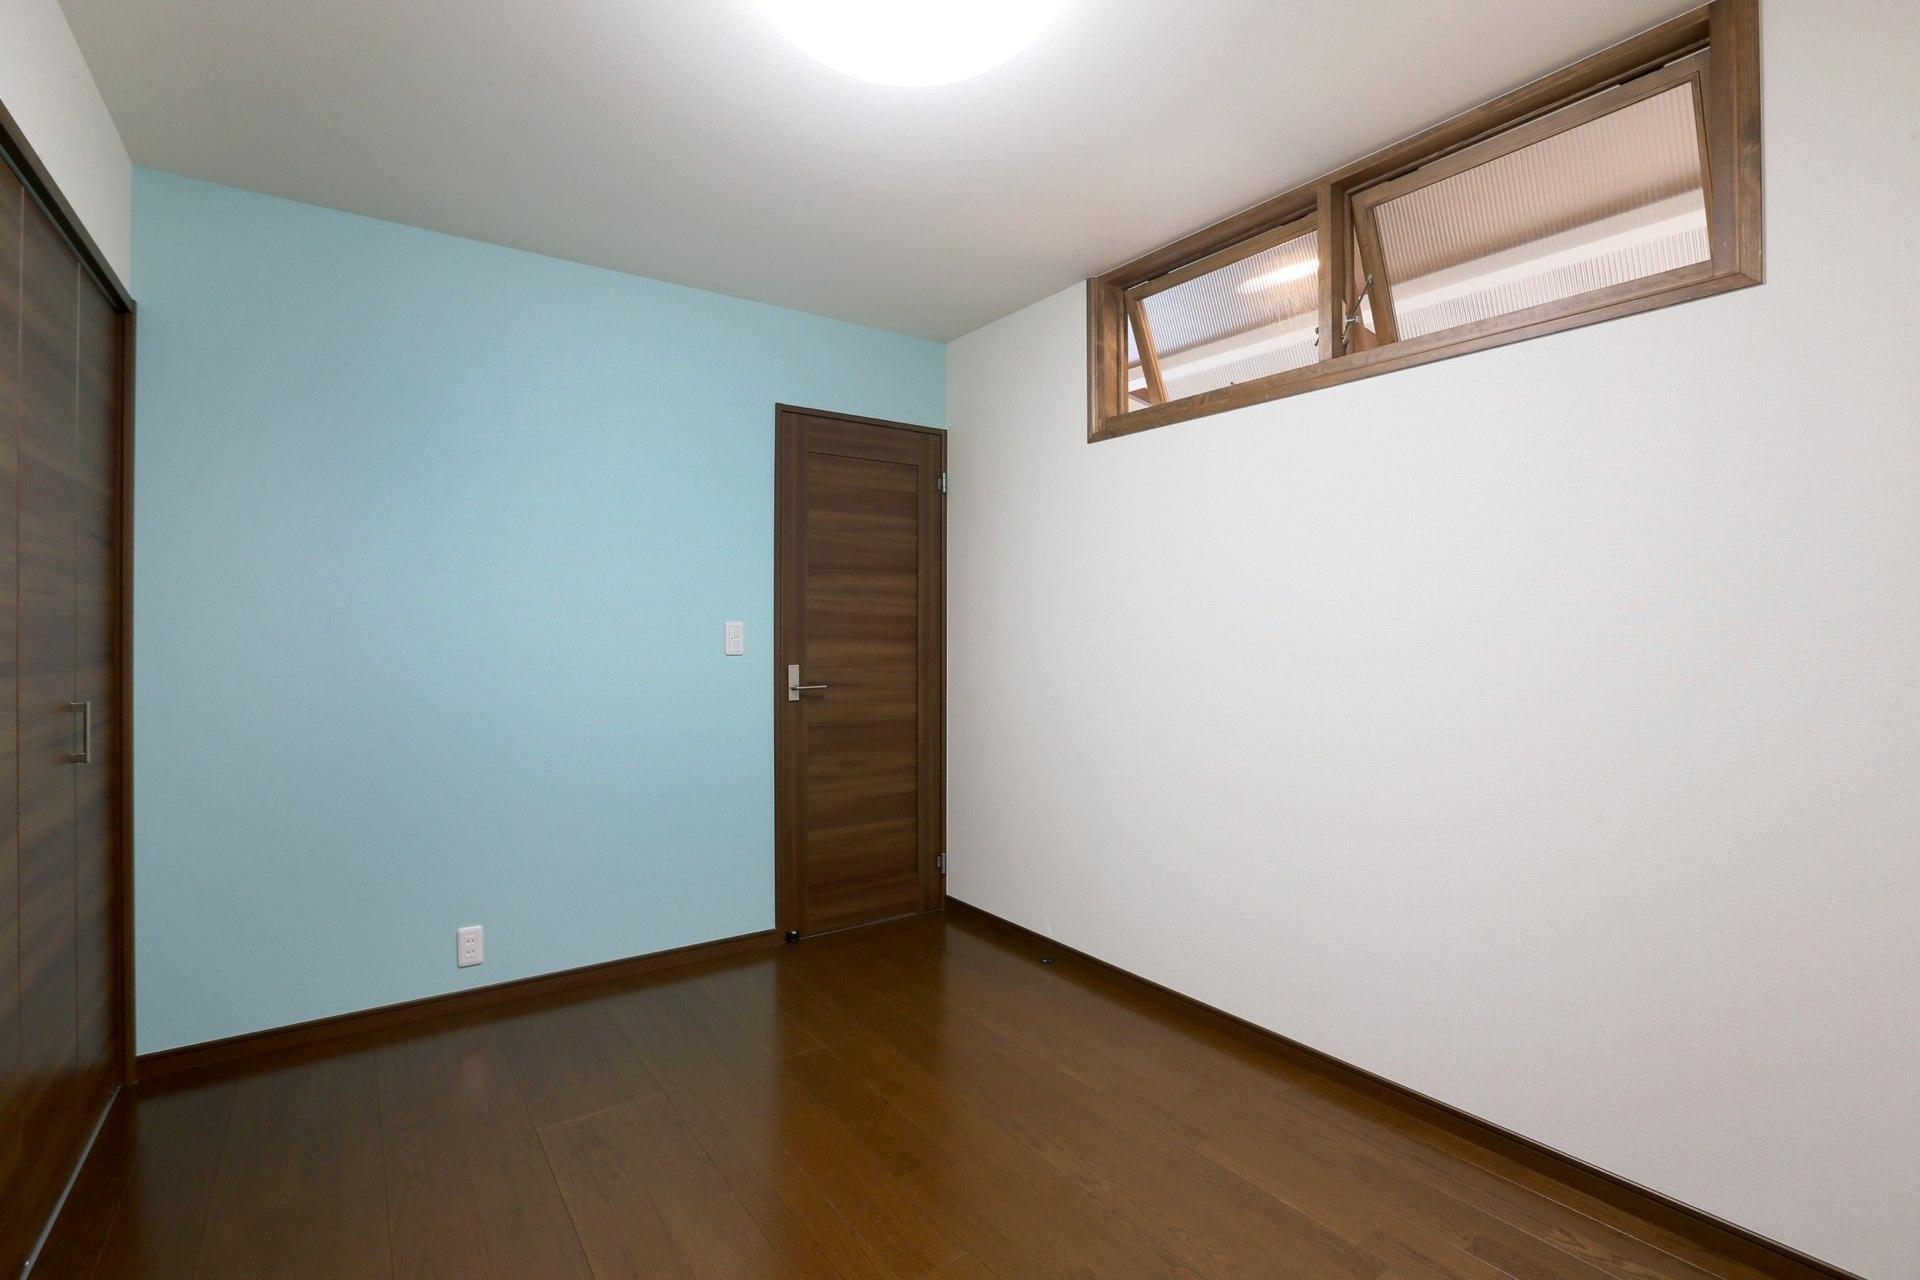 K's residenceの部屋 寝室-スカイブルーのアクセントクロス